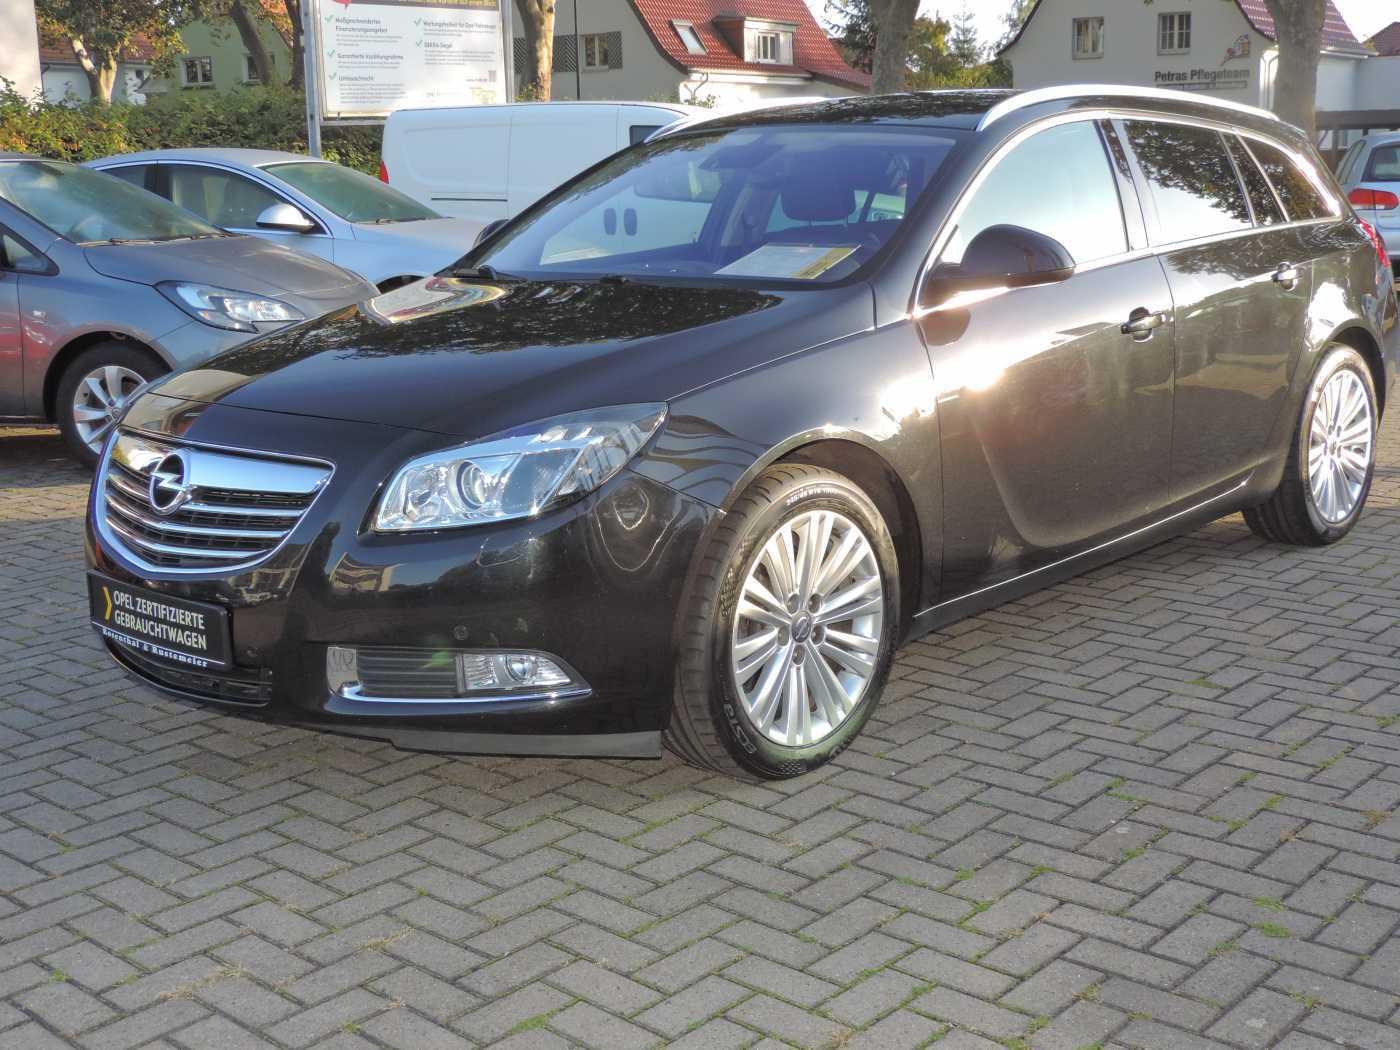 Opel Insignia 2.0 CDTI Sports Tourer Active NAVI+XENON, Jahr 2013, diesel